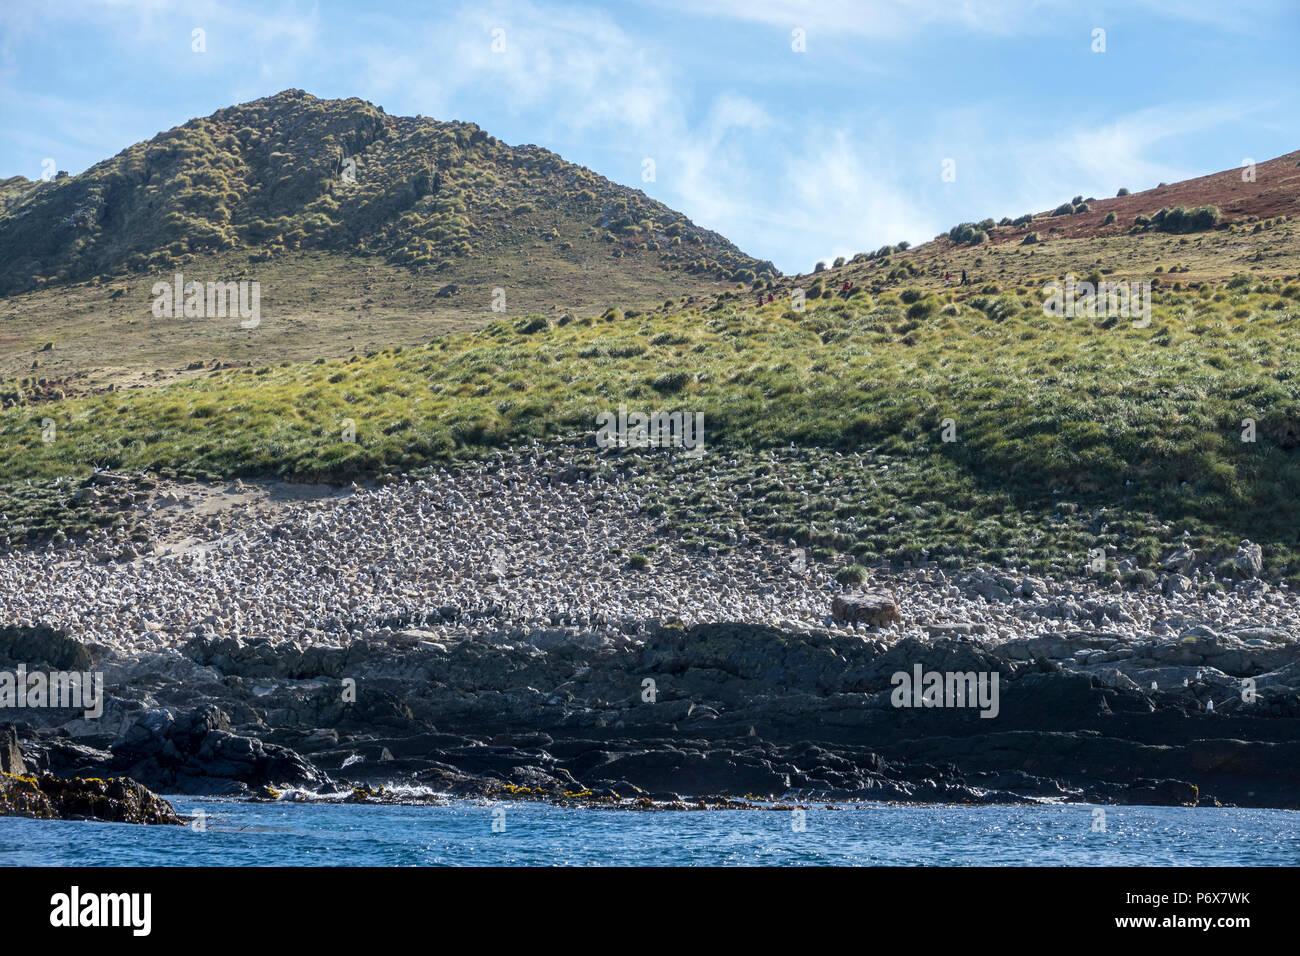 View of the massive black-browed albatross colony at Steeple Jason Island, Falkland Islands Stock Photo